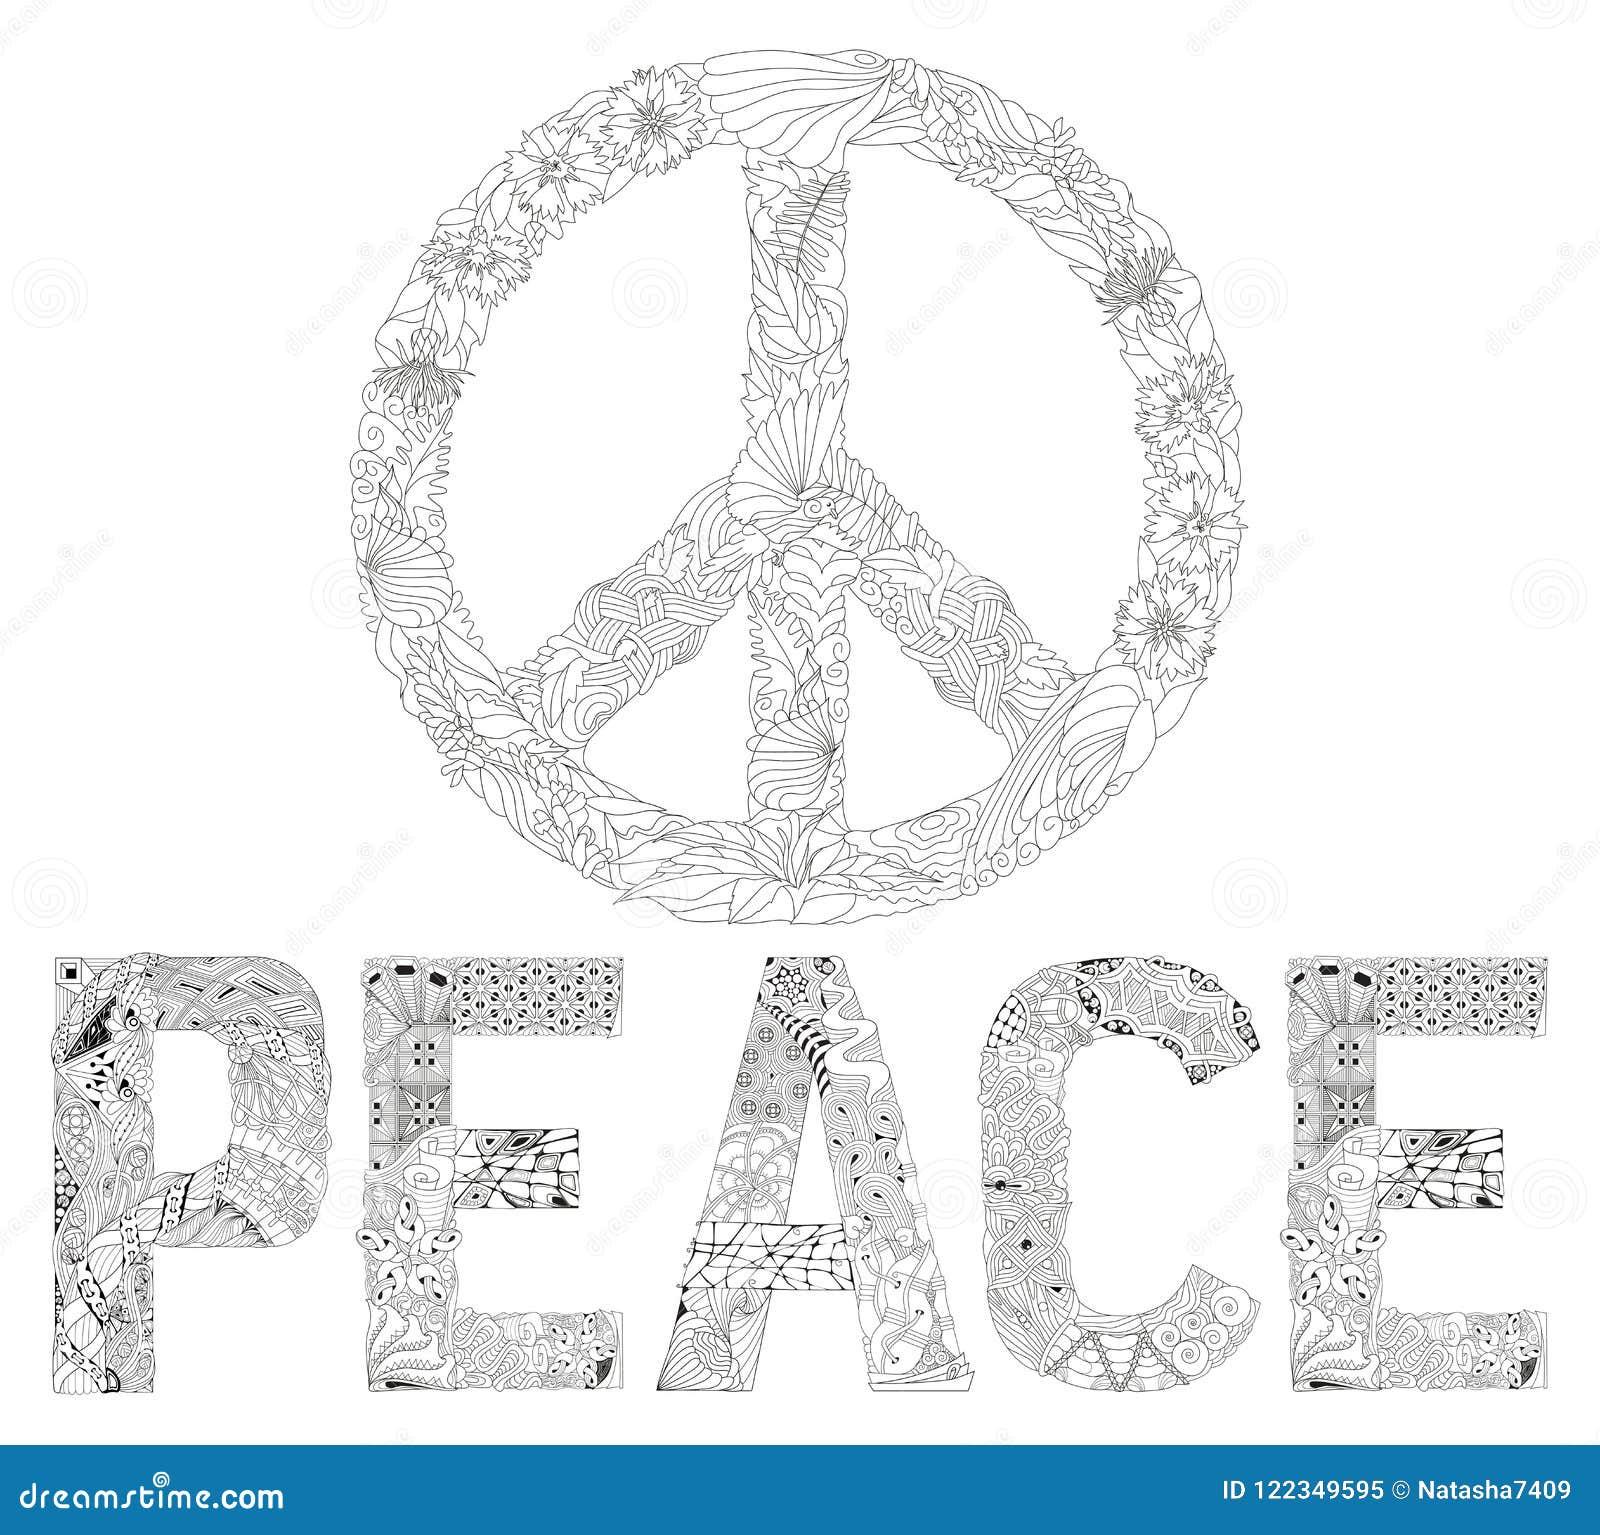 Zentangle Estilizou O Sinal Da Palavra Paz Da Paz Para Colorir